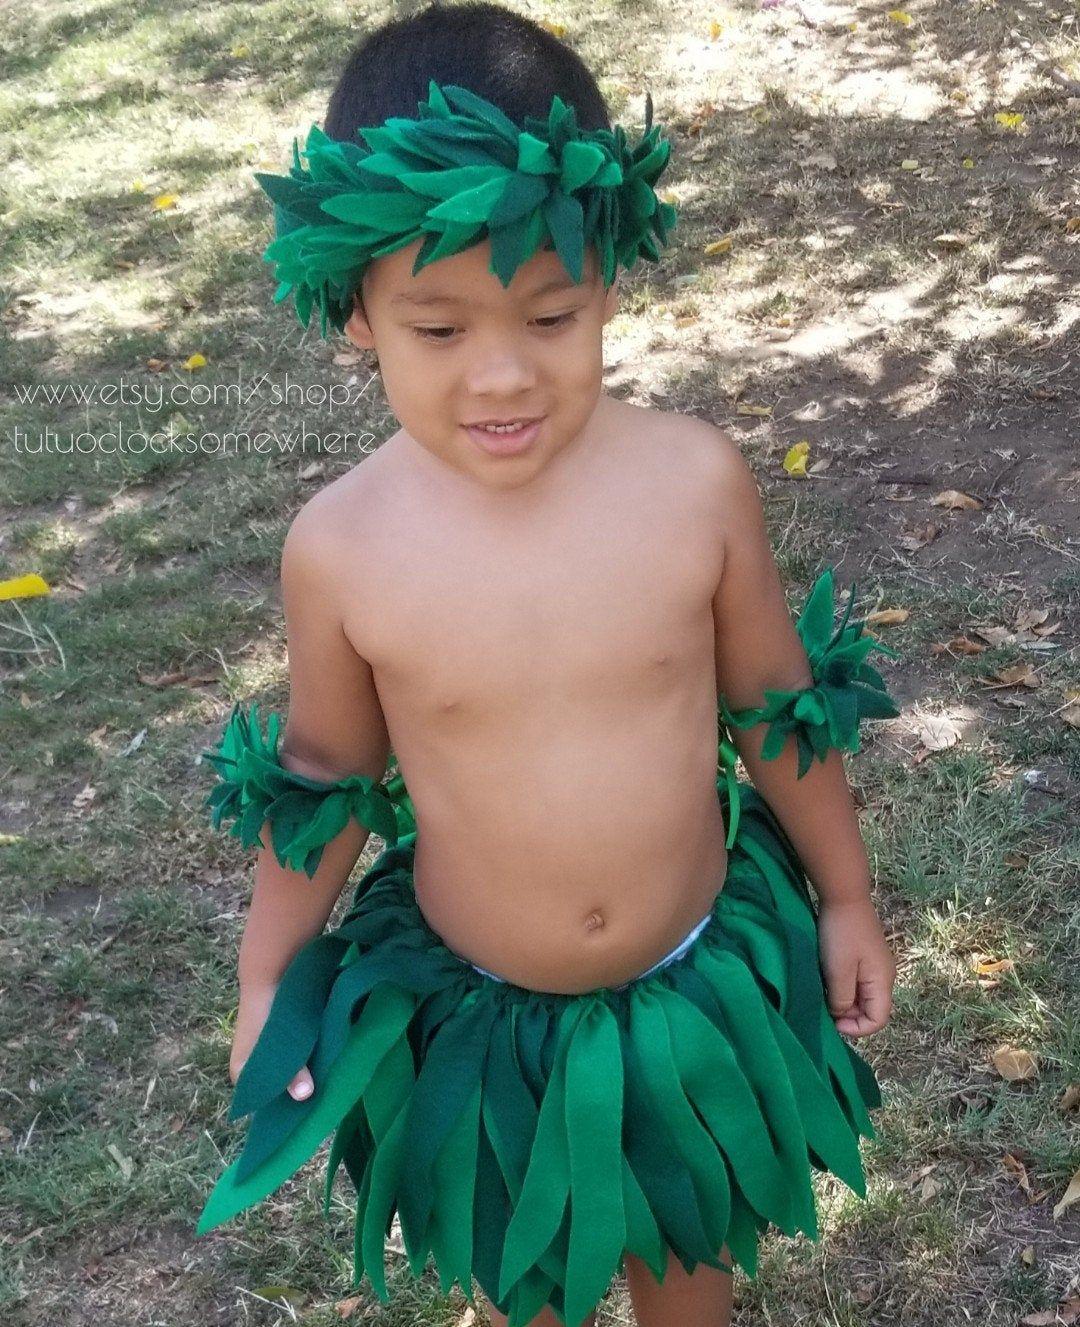 FUN FOR ALL! 4-Piece Set Maui Costume Lilo Costume Birthday Party Hawaiian Luau Tropical Moana Halloween Unisex 5K Baby Toddler Teen Adult #hawaiianluauparty